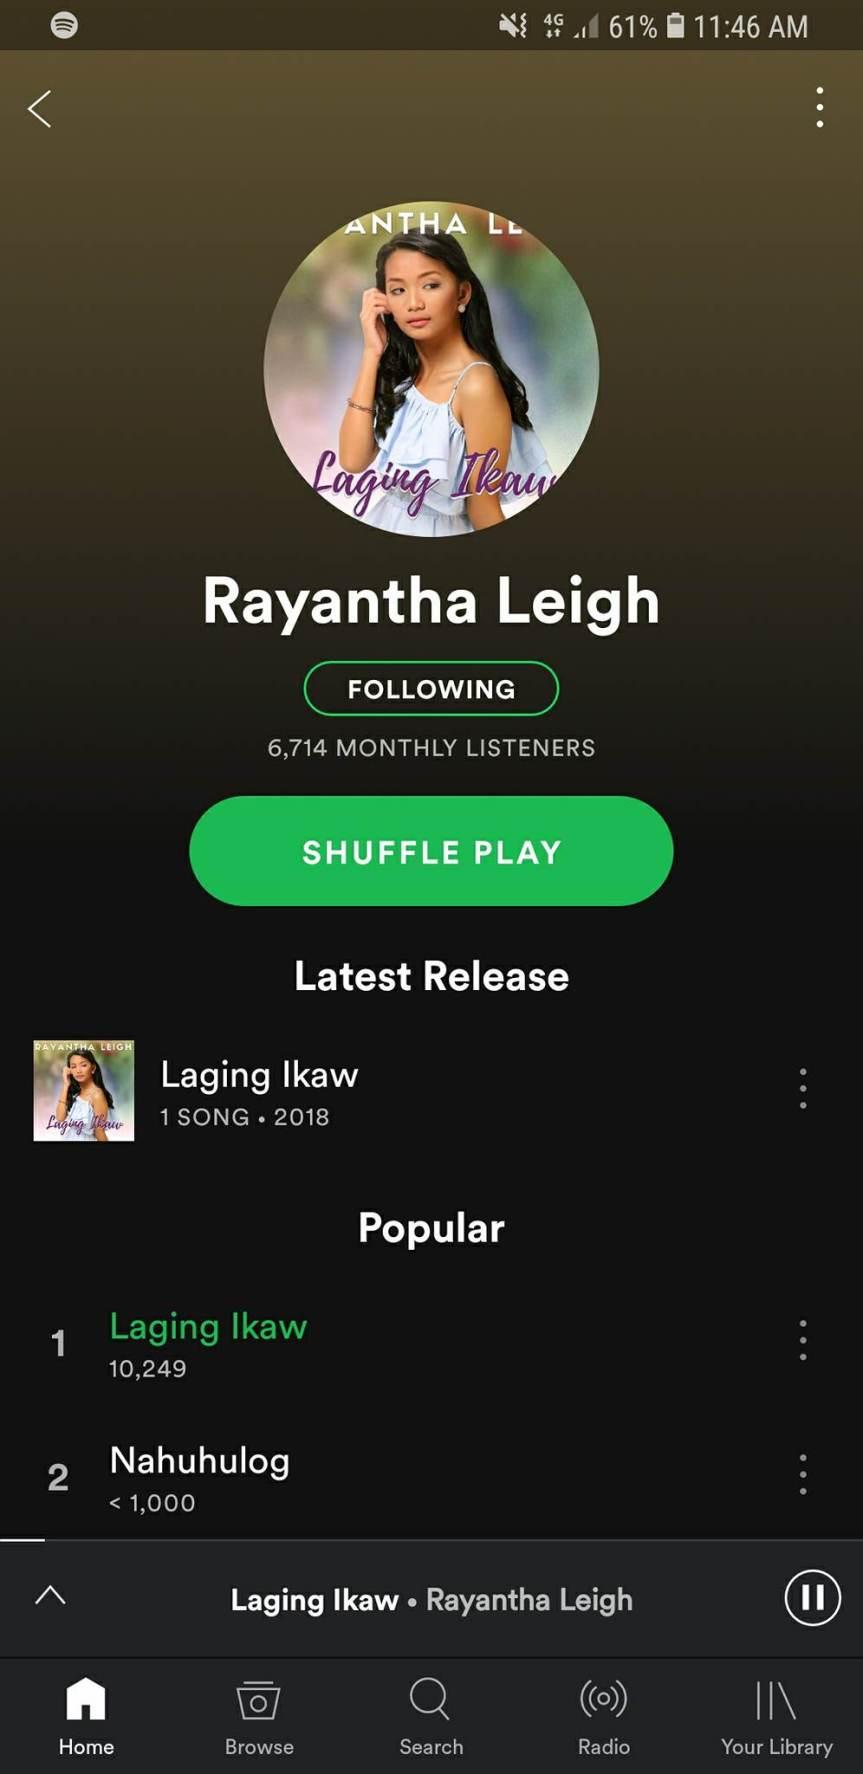 Rayantha Leigh spotify